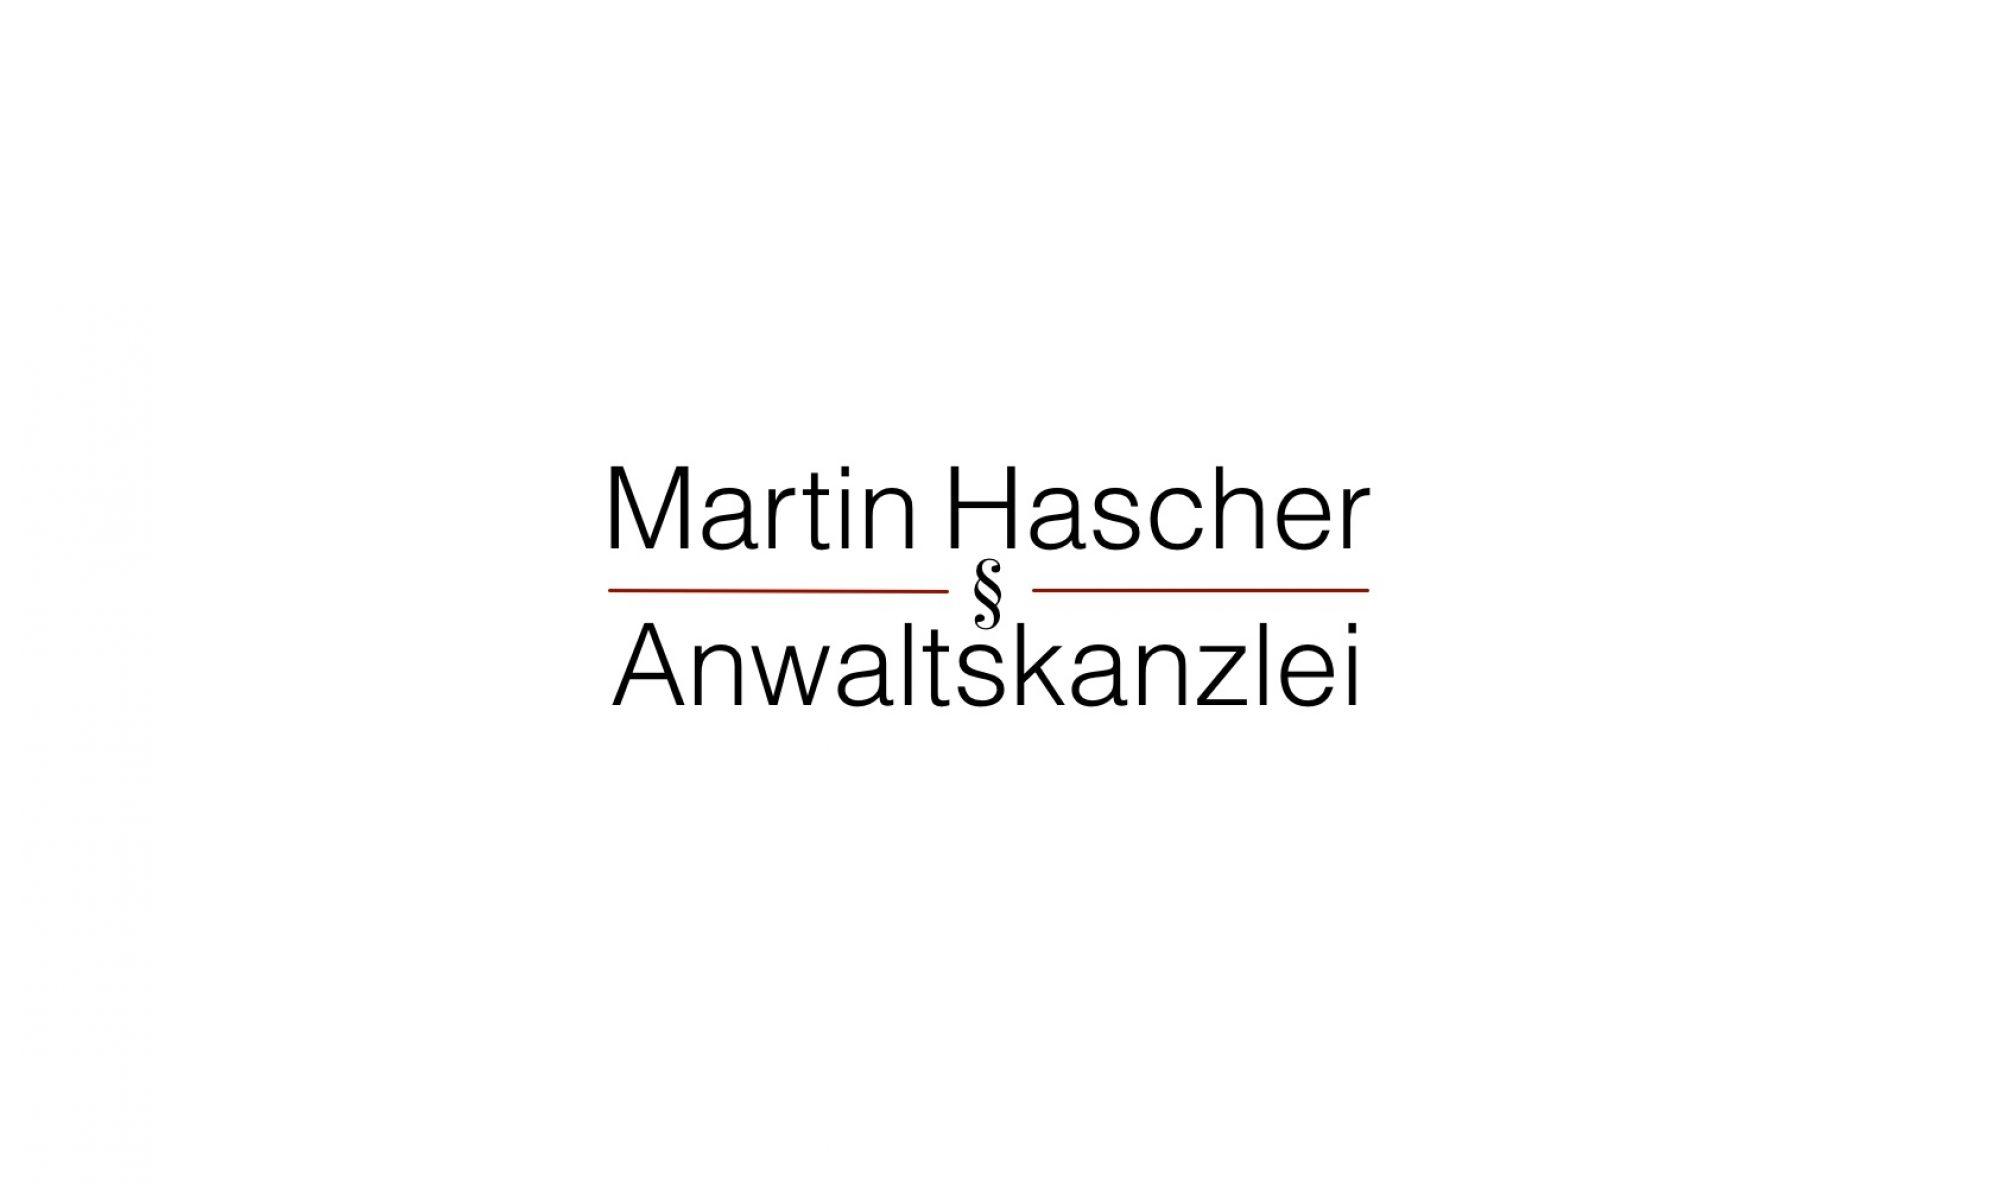 Anwaltskanzlei Hascher